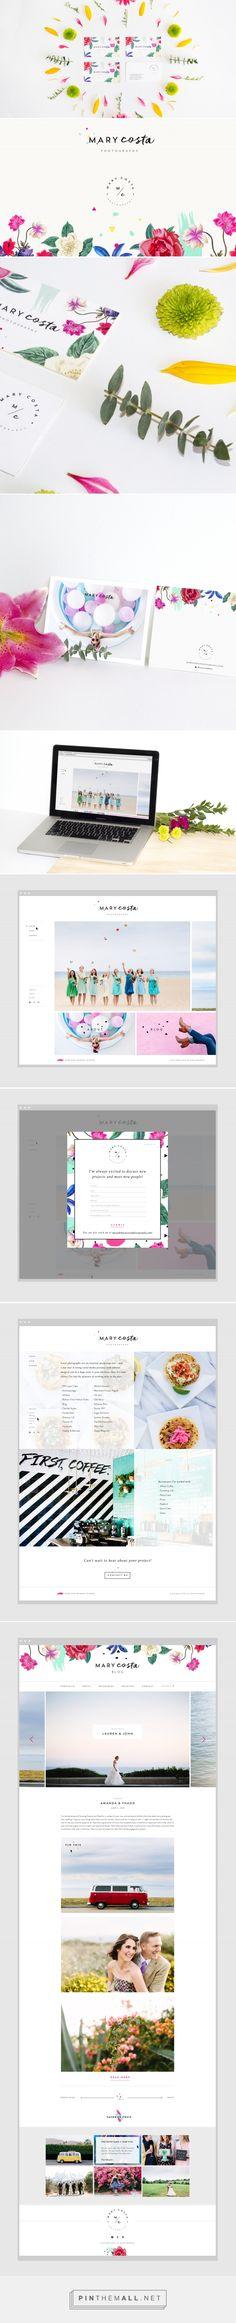 Mary Costa Branding by Kati Forner | Fivestar Branding – Design and Branding Agency & Inspiration Gallery